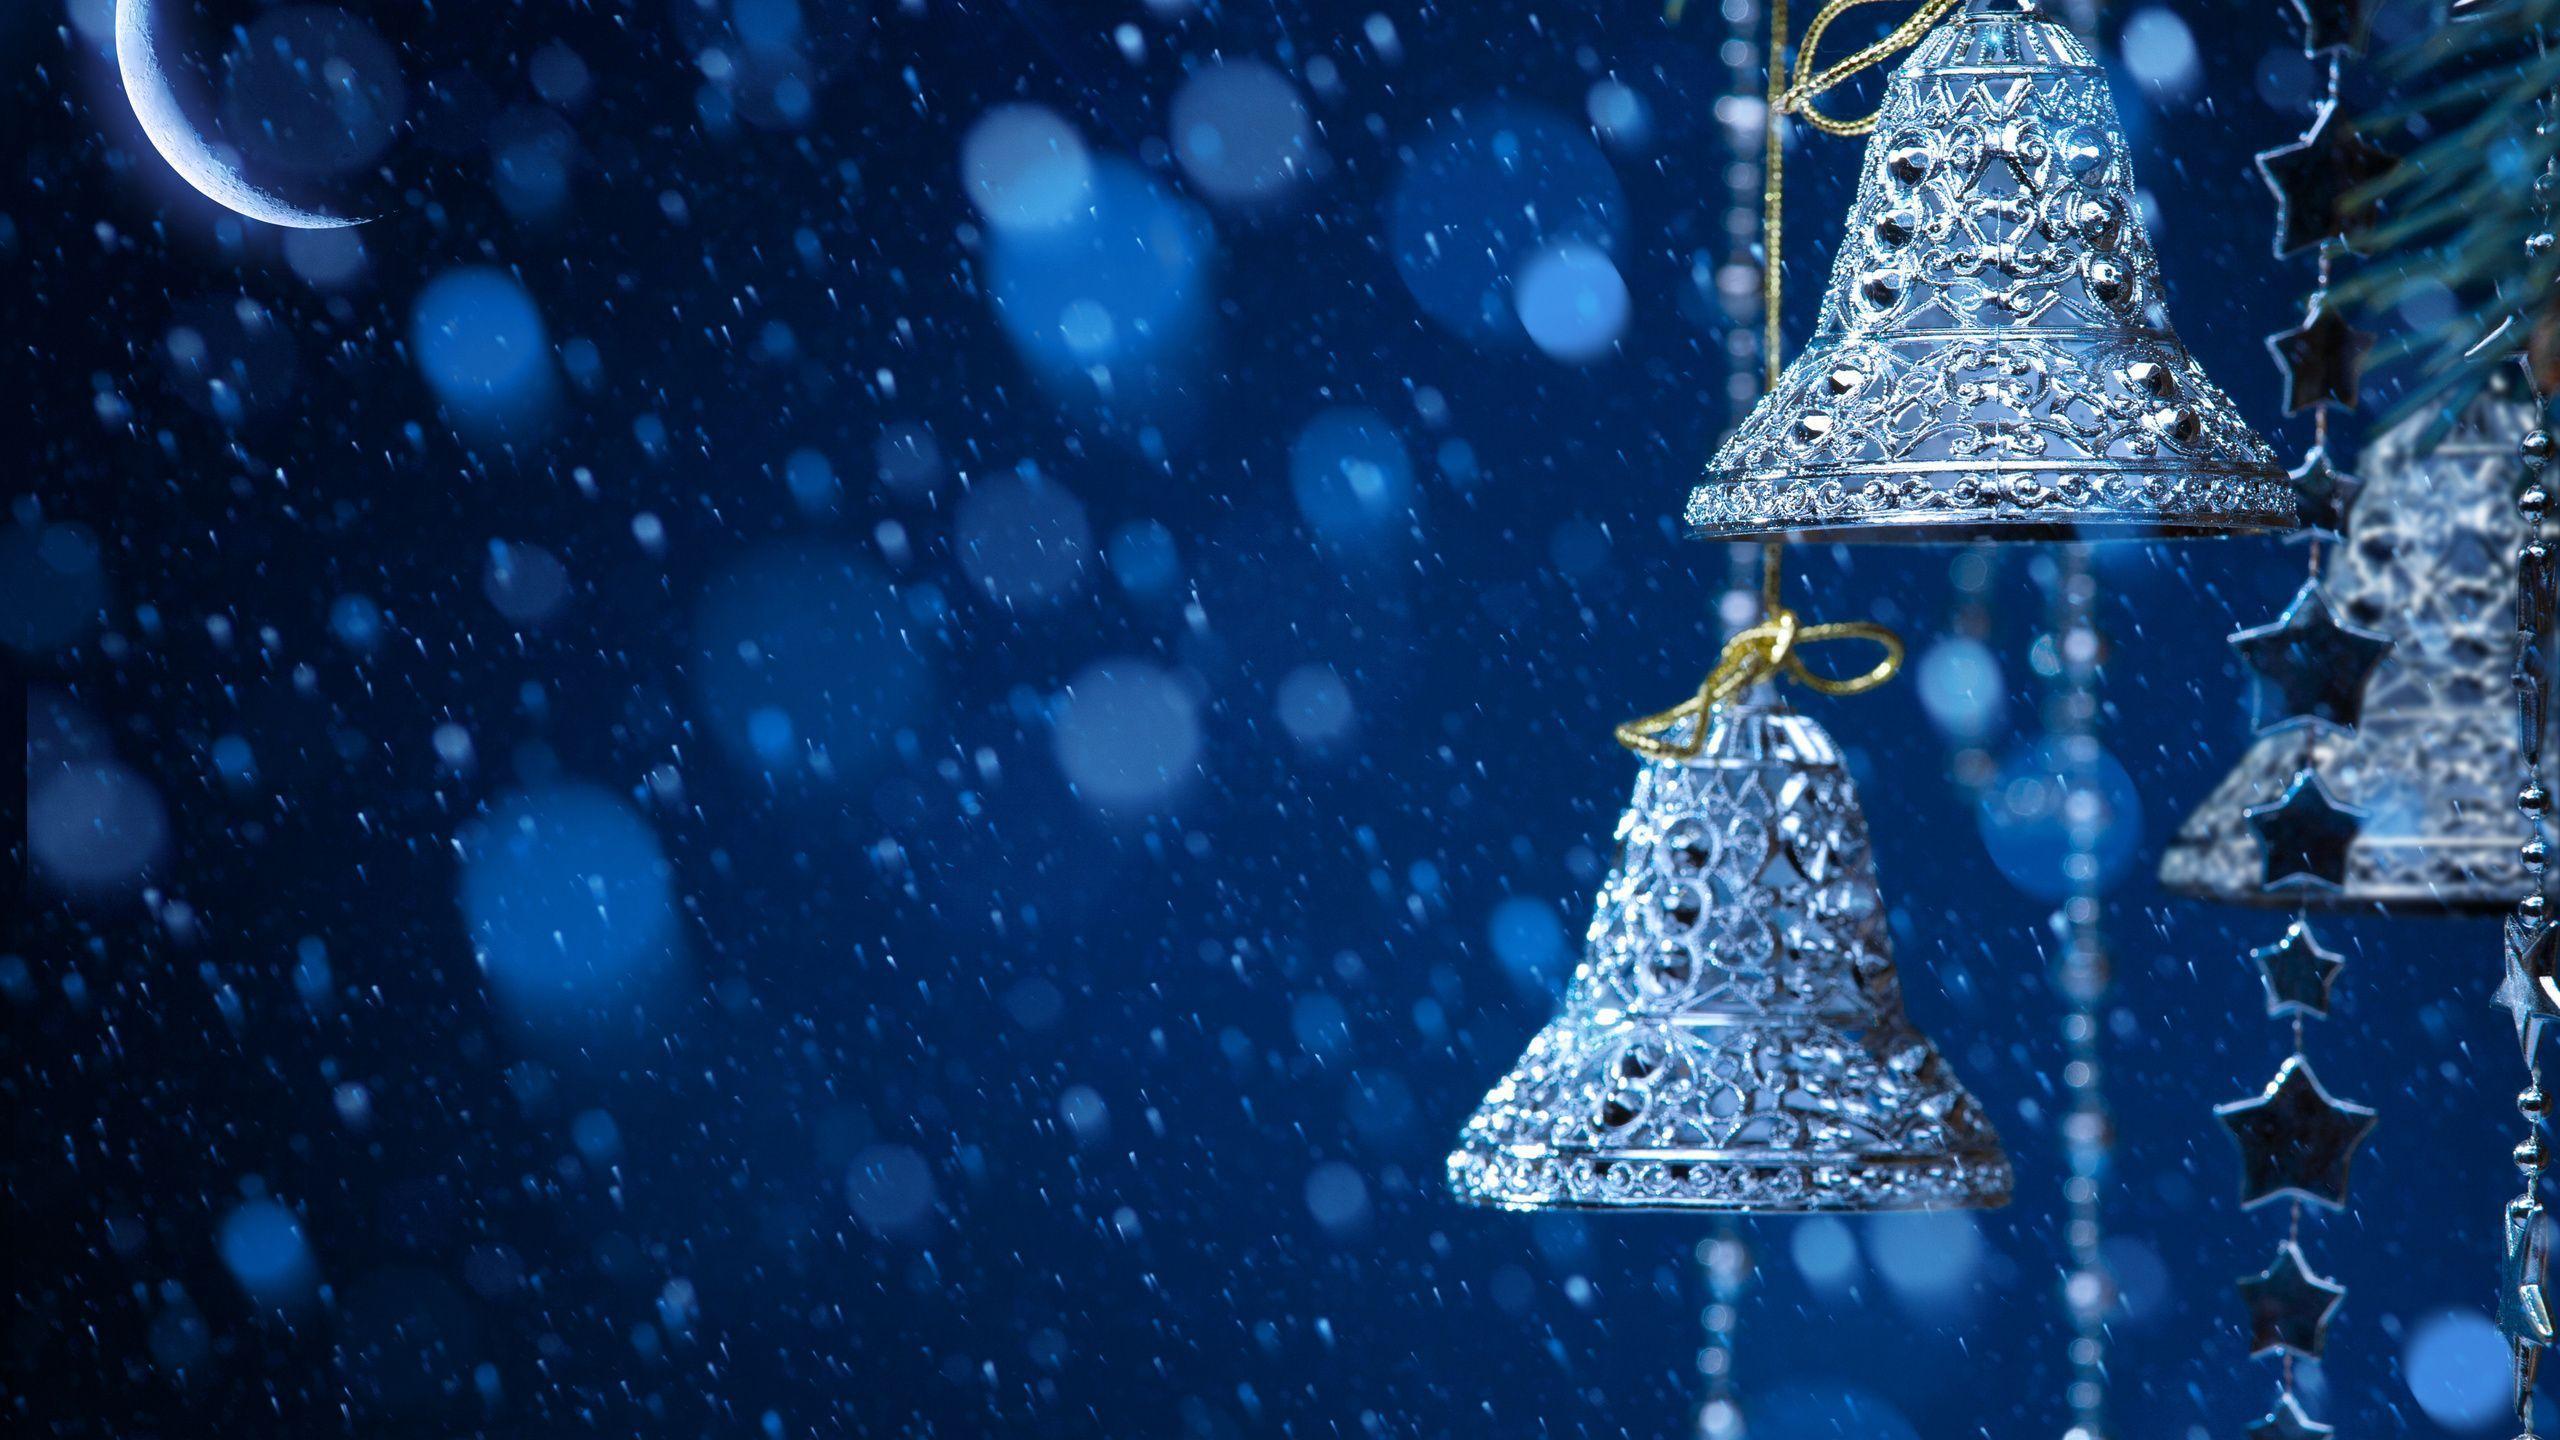 Images For u003e Silver Bells Flower  Snowfall wallpaper, Merry